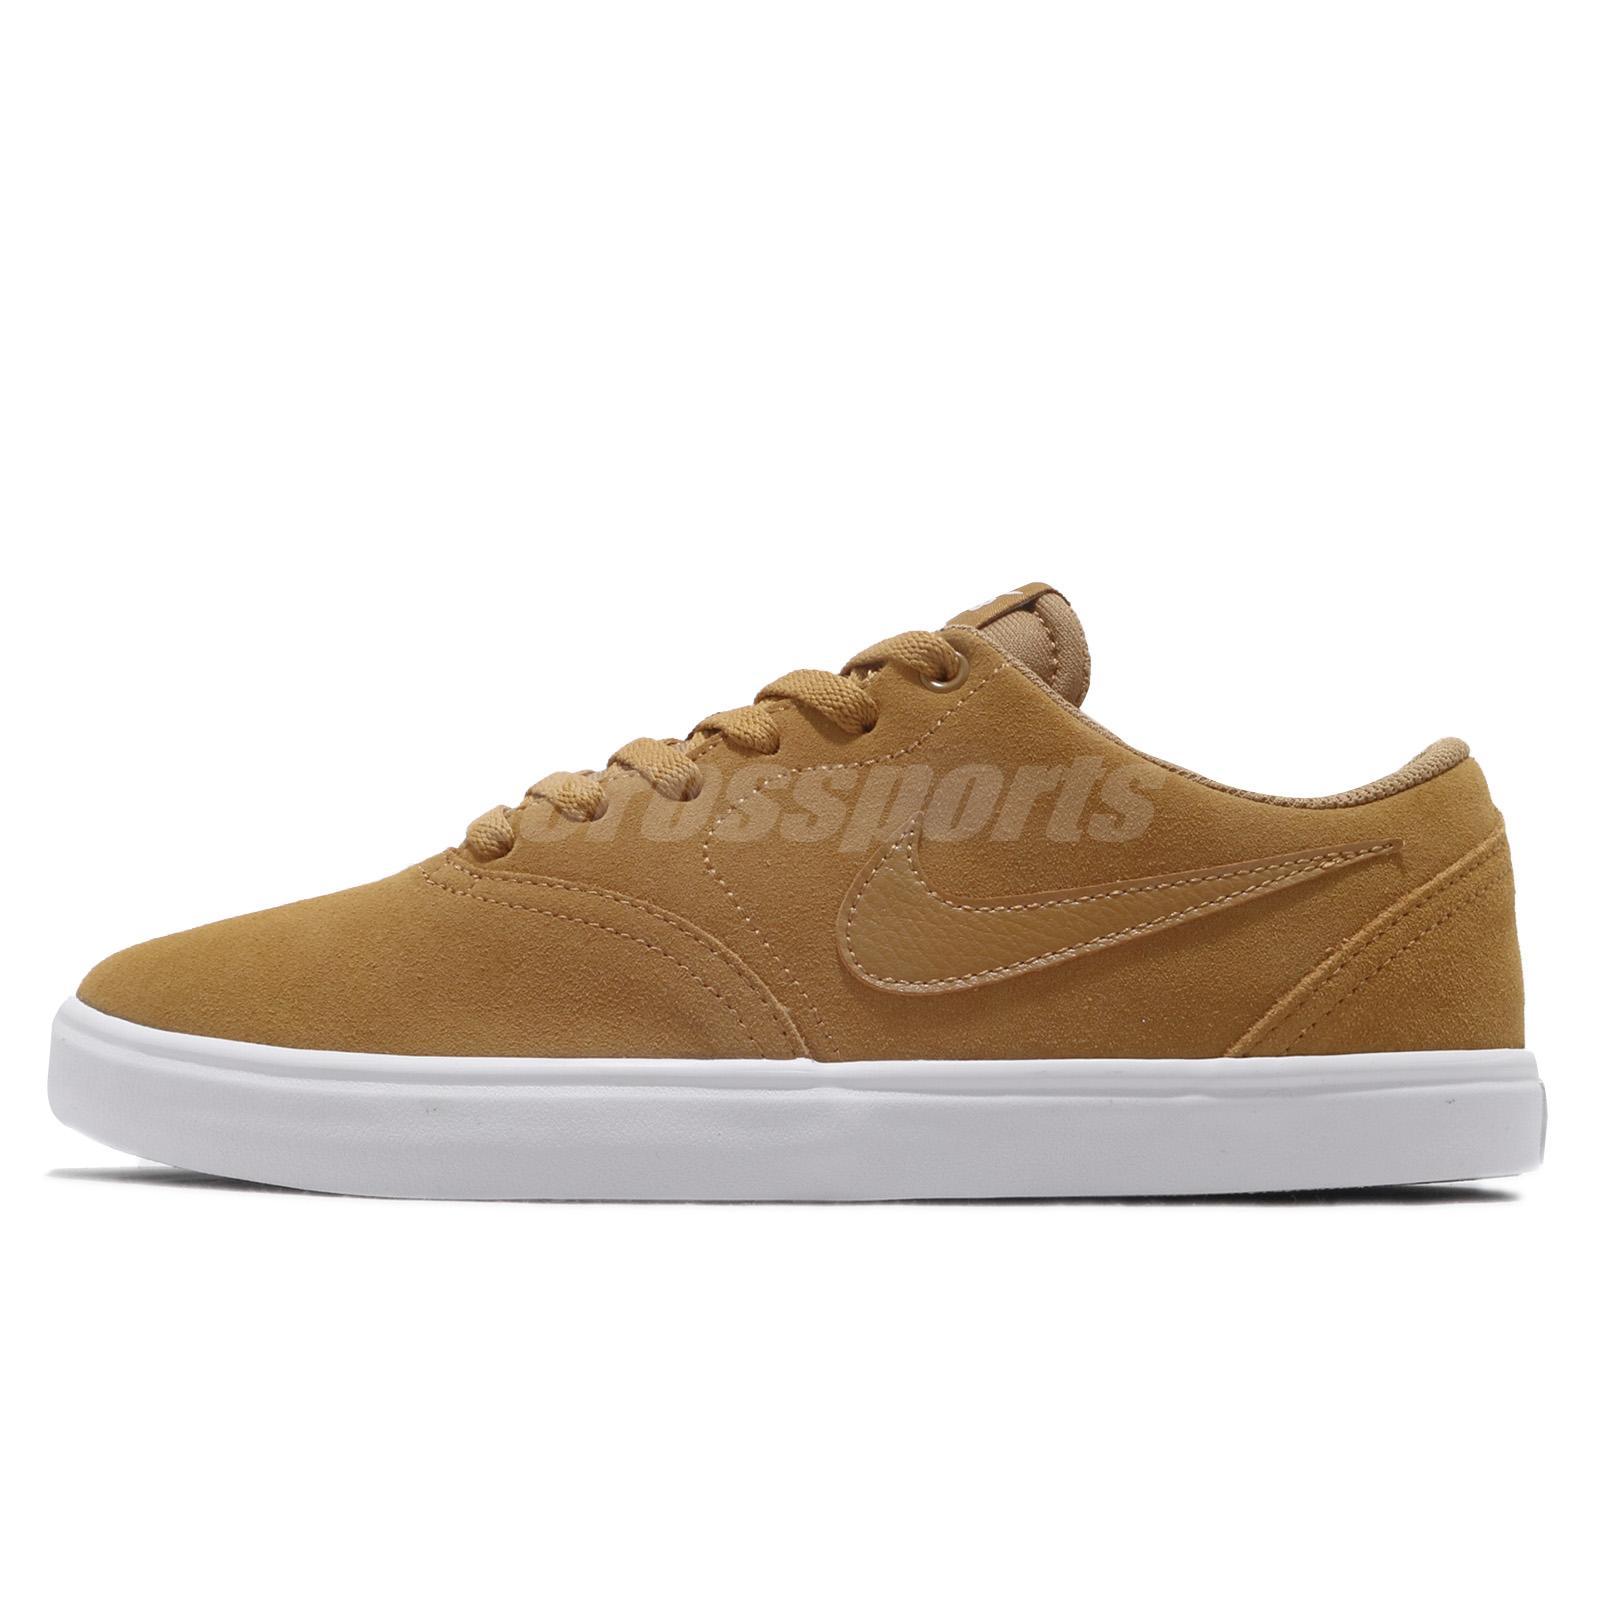 b43f800d88d Nike SB Check Solar Wheat Phantom Men Skate Boarding Shoes Sneakers  843895-770